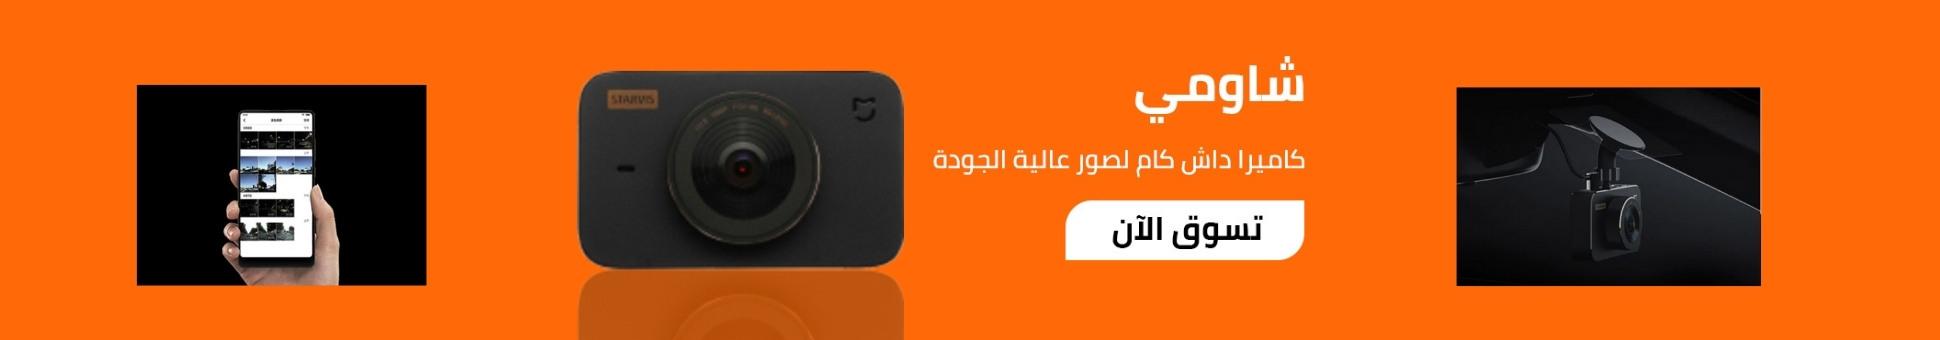 Dash-camera-banner-web&app